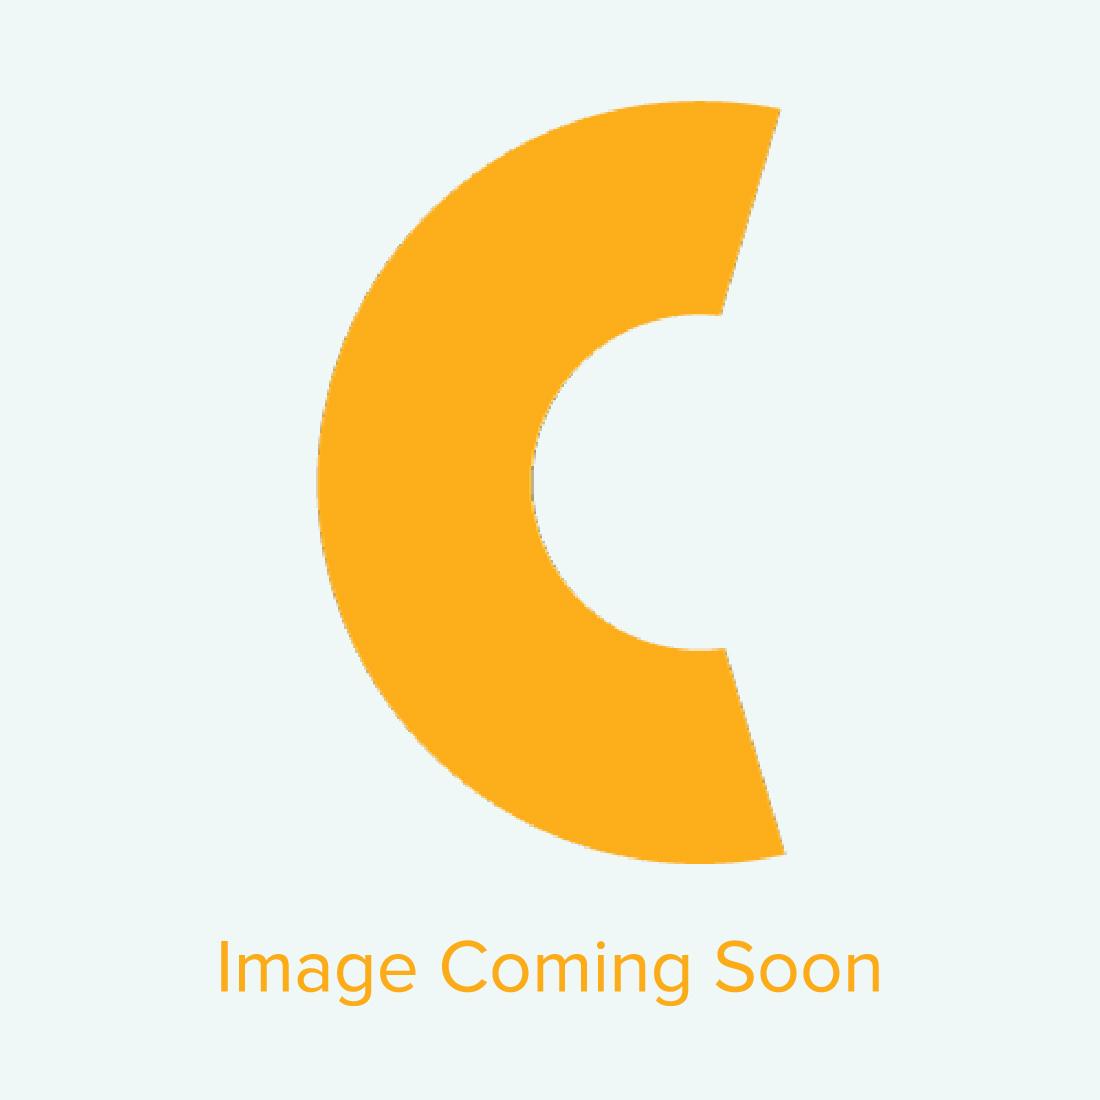 Standard Cross Cutter for FC8000/FC8600/FC7000mK2/FC7000